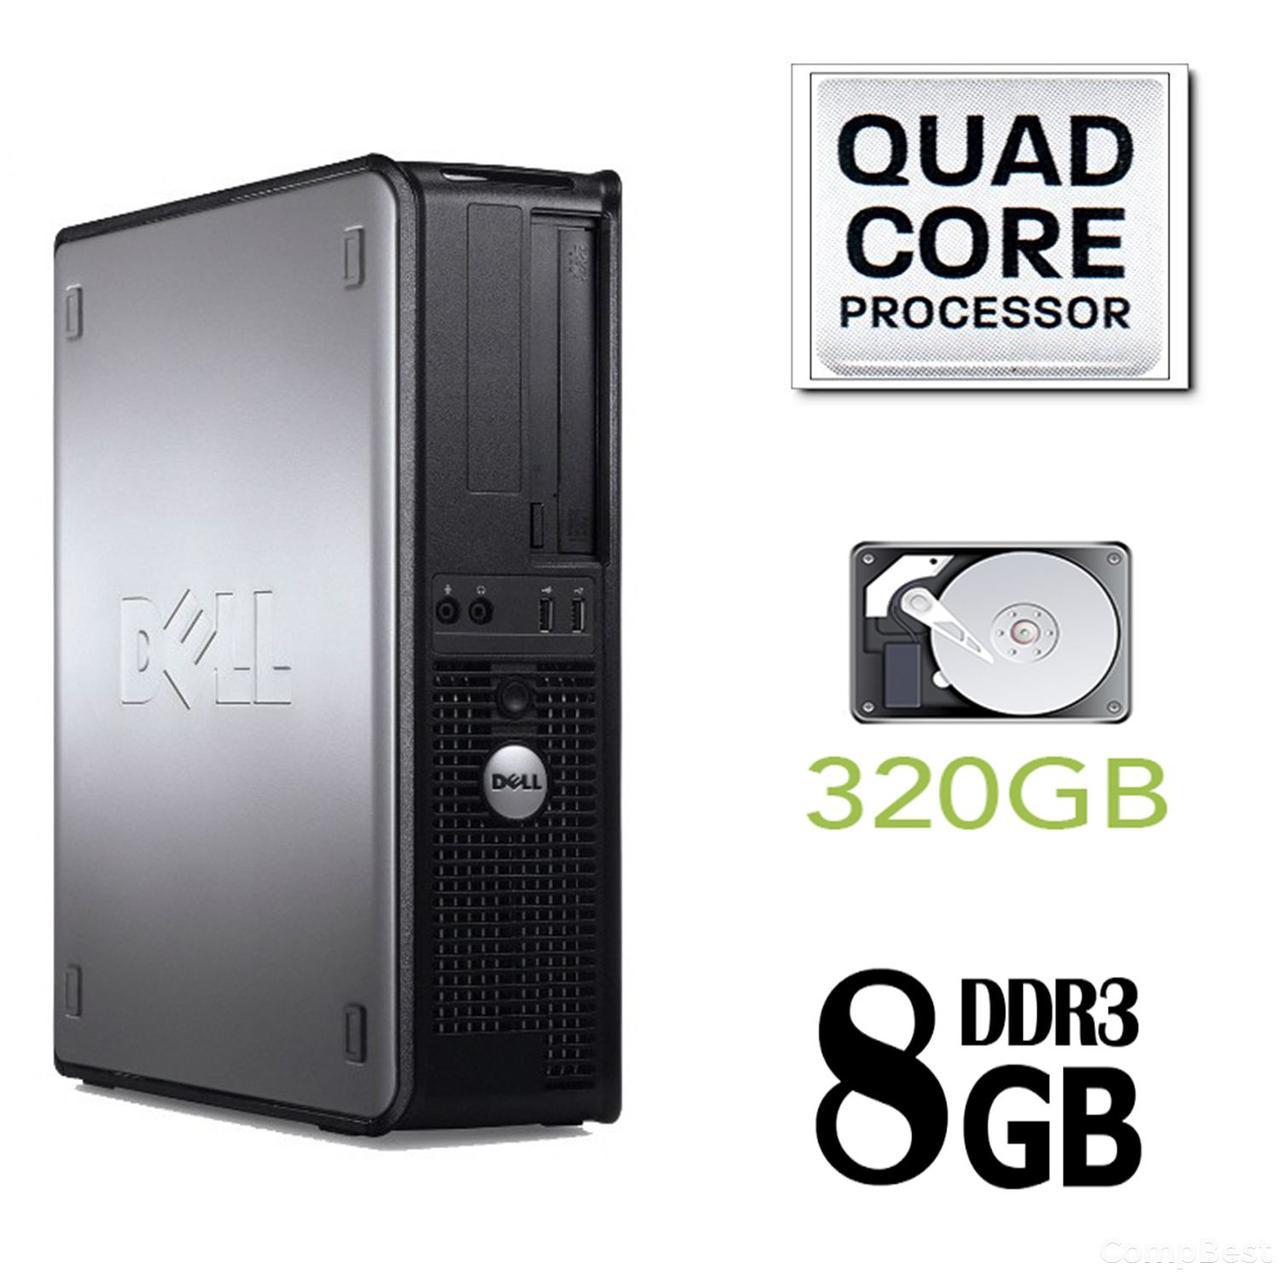 Dell 780 SFF / Intel Core 2 Quad Q8200 (4 ядра по 2.33GHz) / 8GB DDR3 / 320GB HDD / без привода